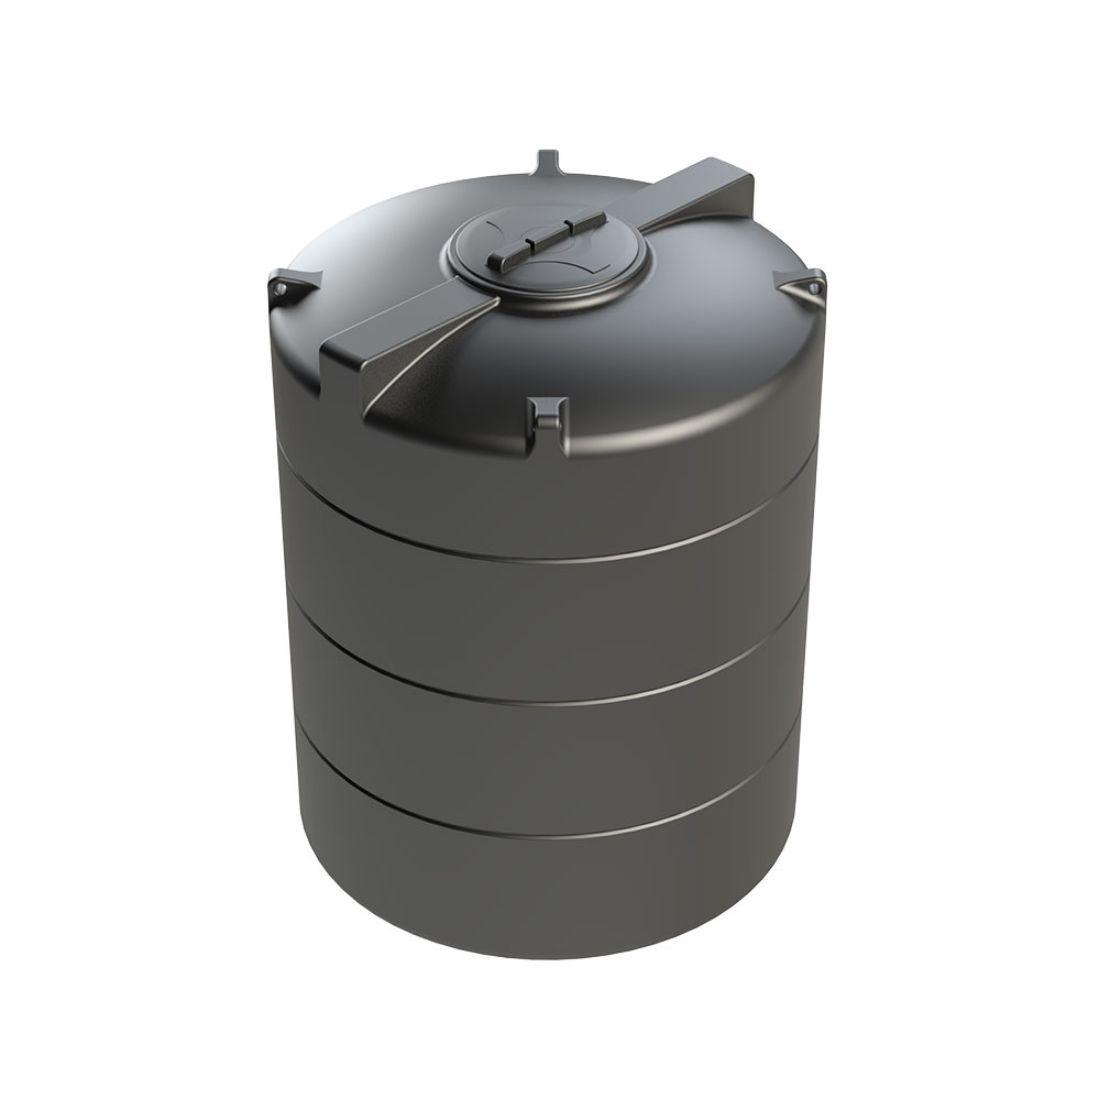 Enduramaxx 2,500 Litre Vertical Non-Potable Water Storage Tank